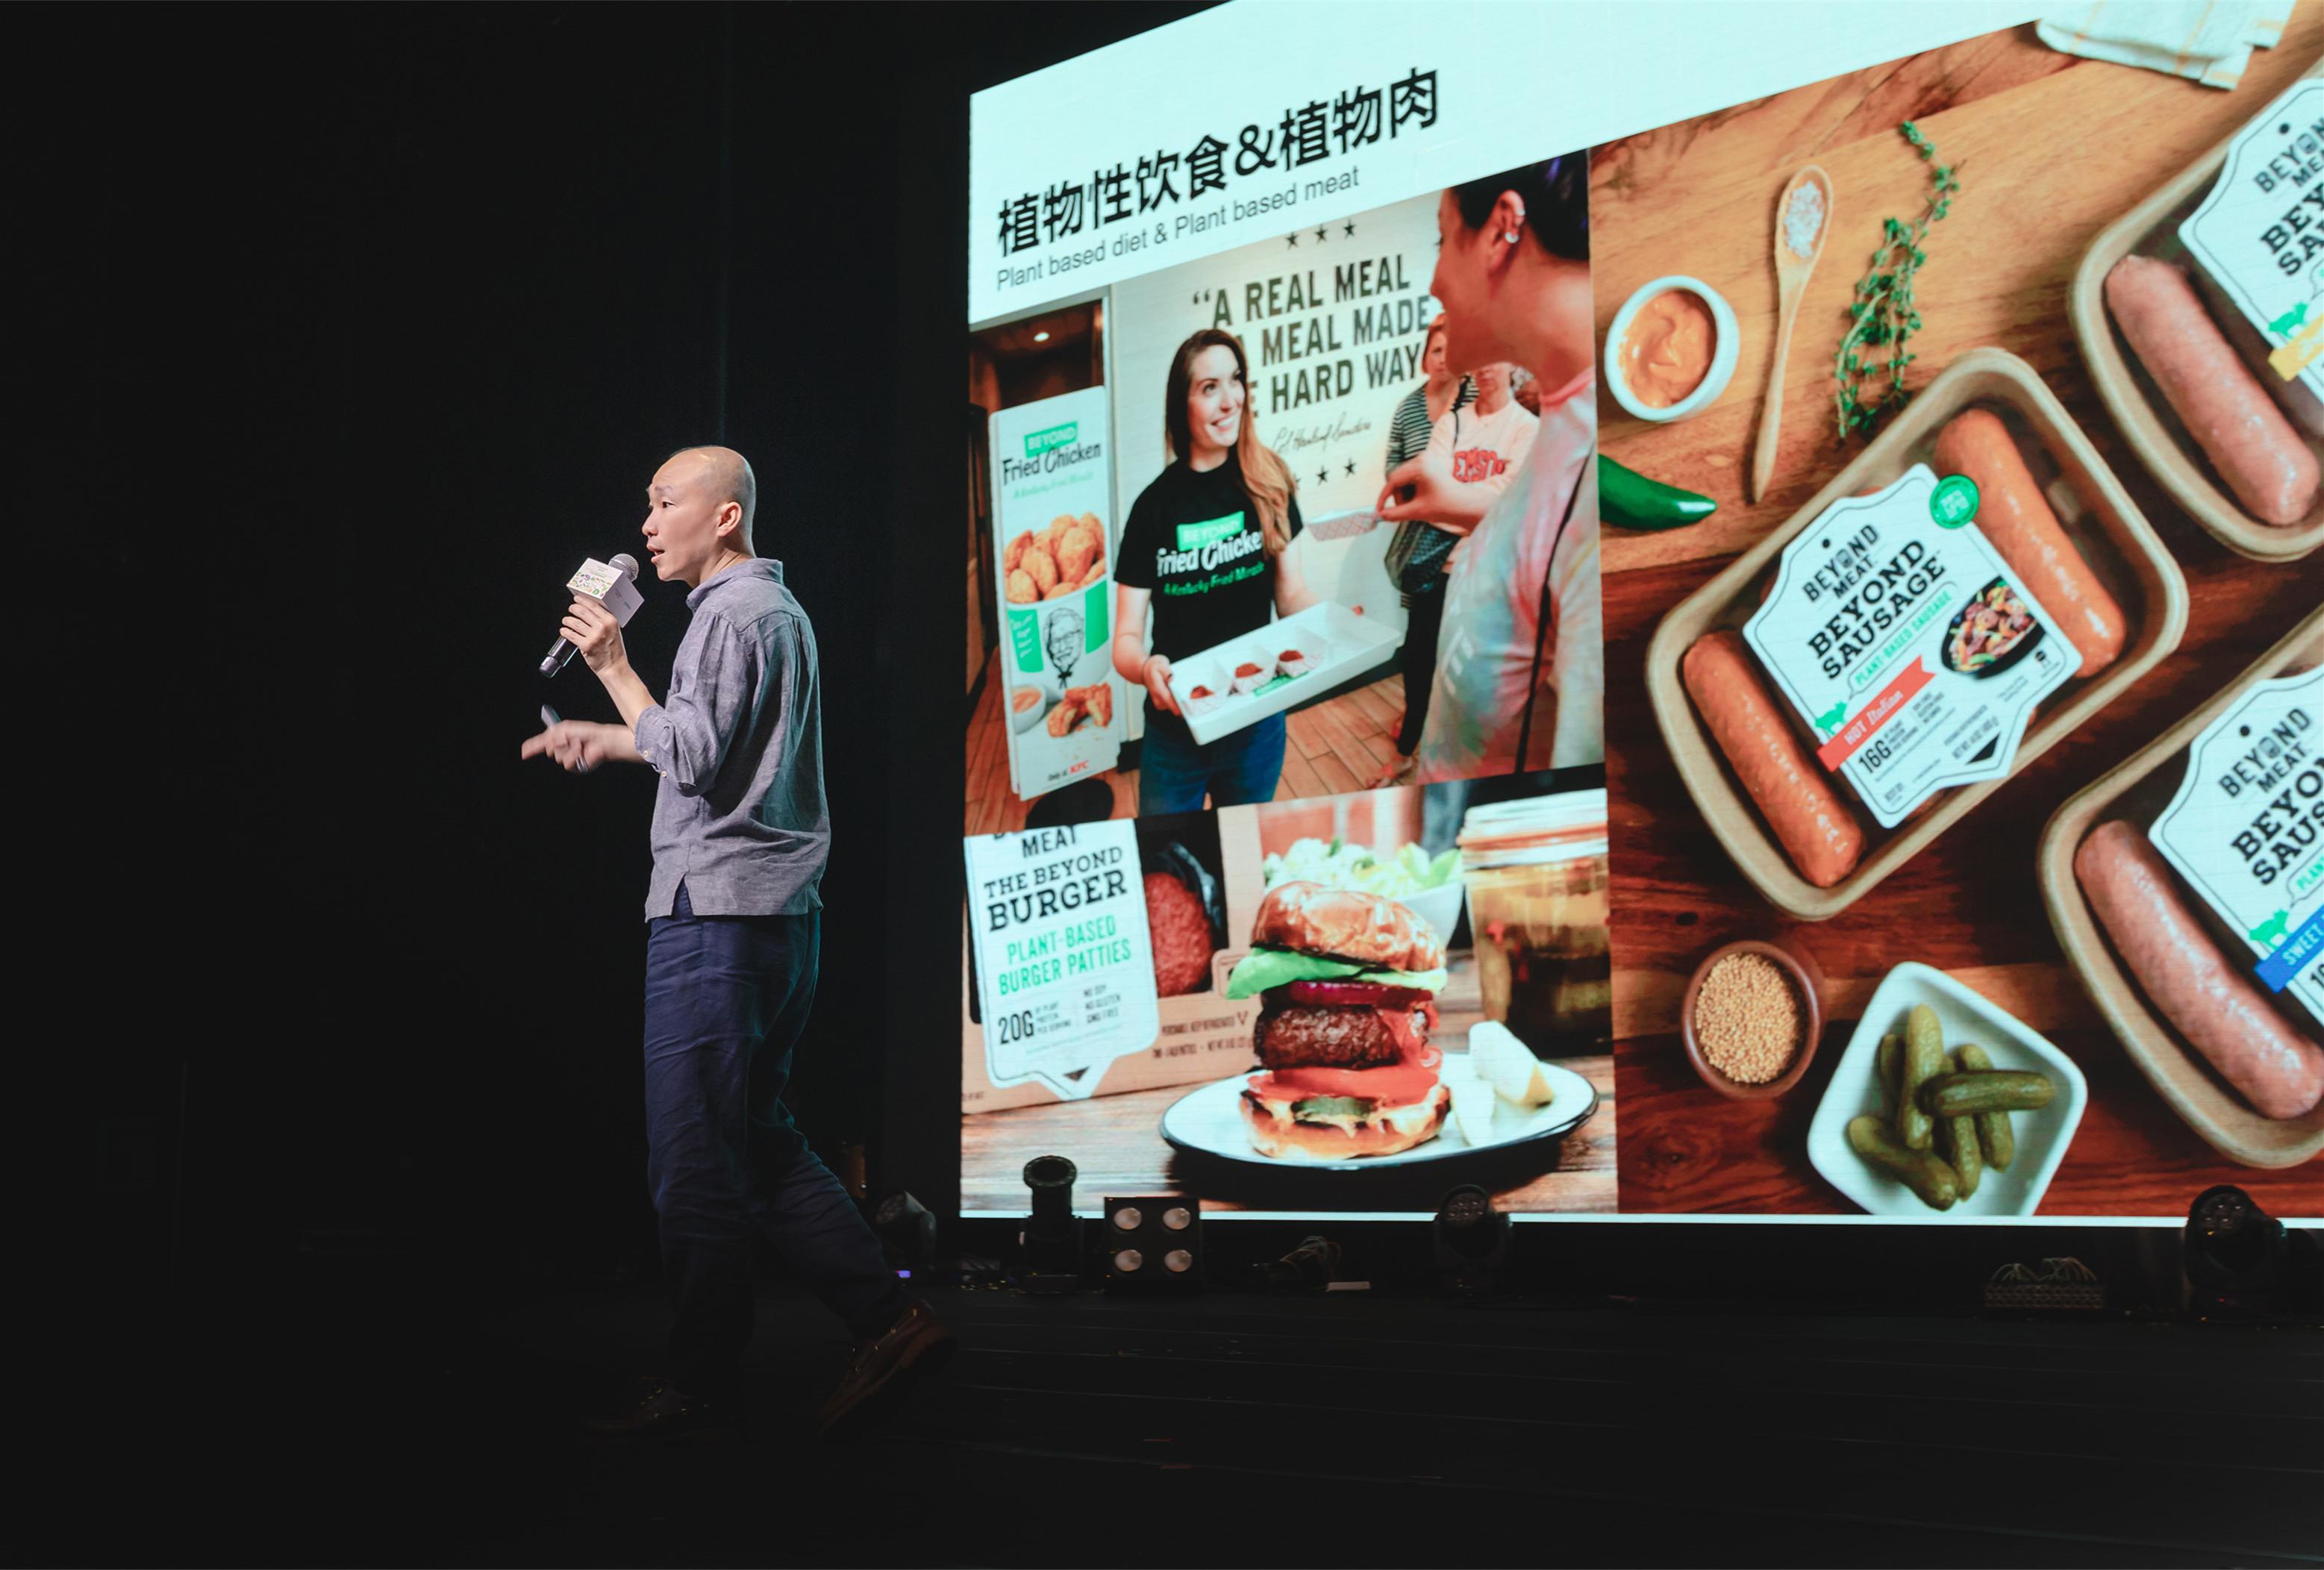 XINTIANDI新天地社交美味大赏再度来袭!2019天地餐厅周正式启幕